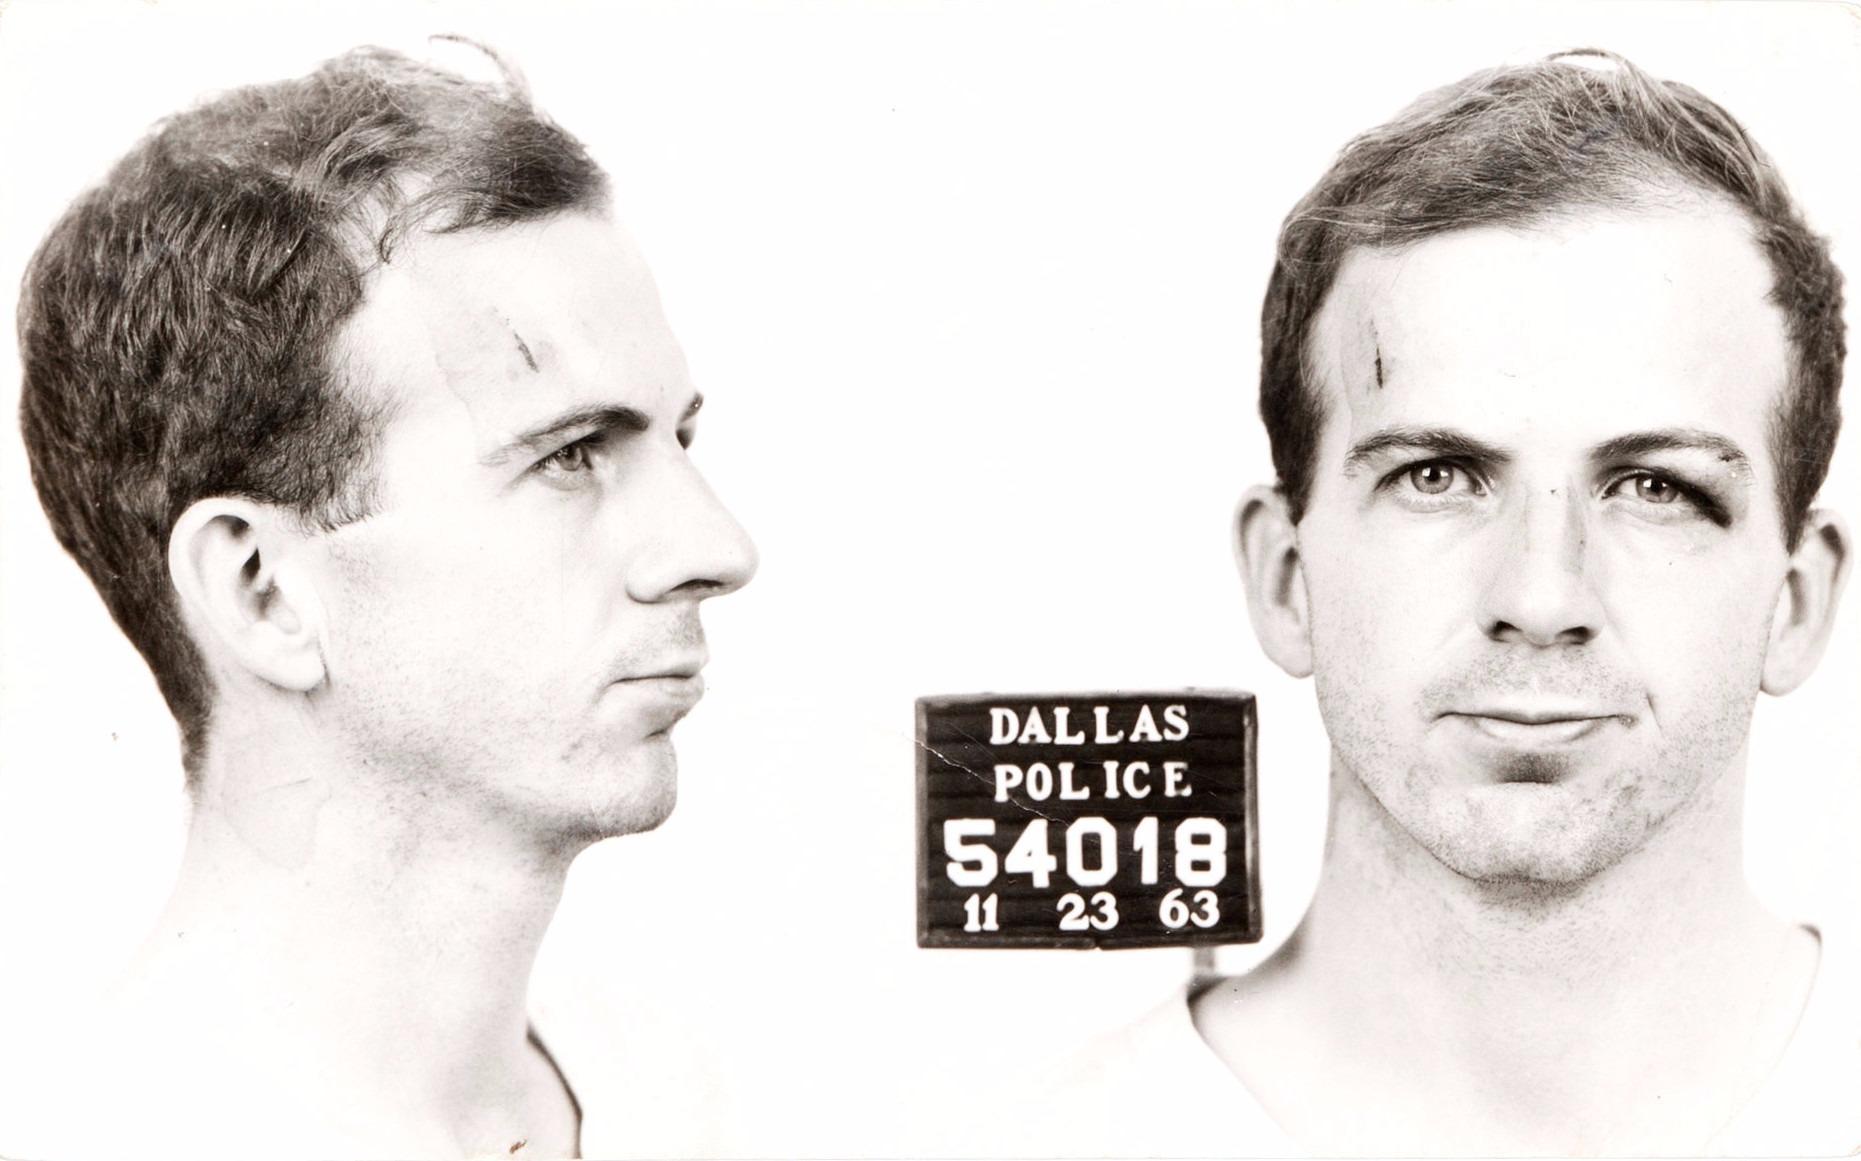 фото из полиции Даласса